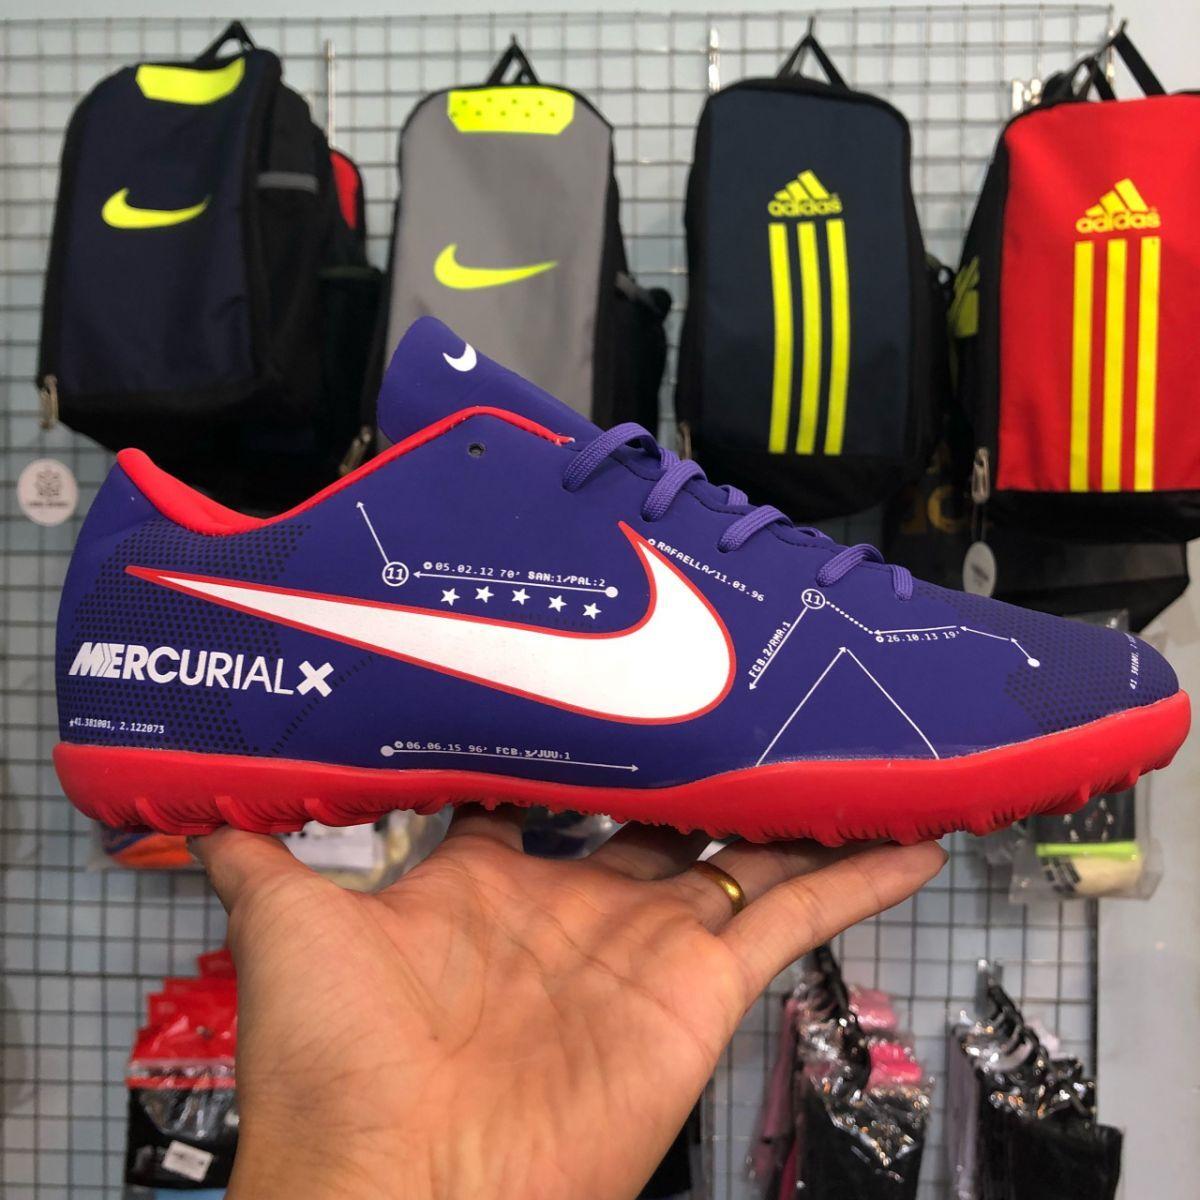 d739f2156bf Giày Nike Mercurial X Neymar (TF) Tím (Fake1)